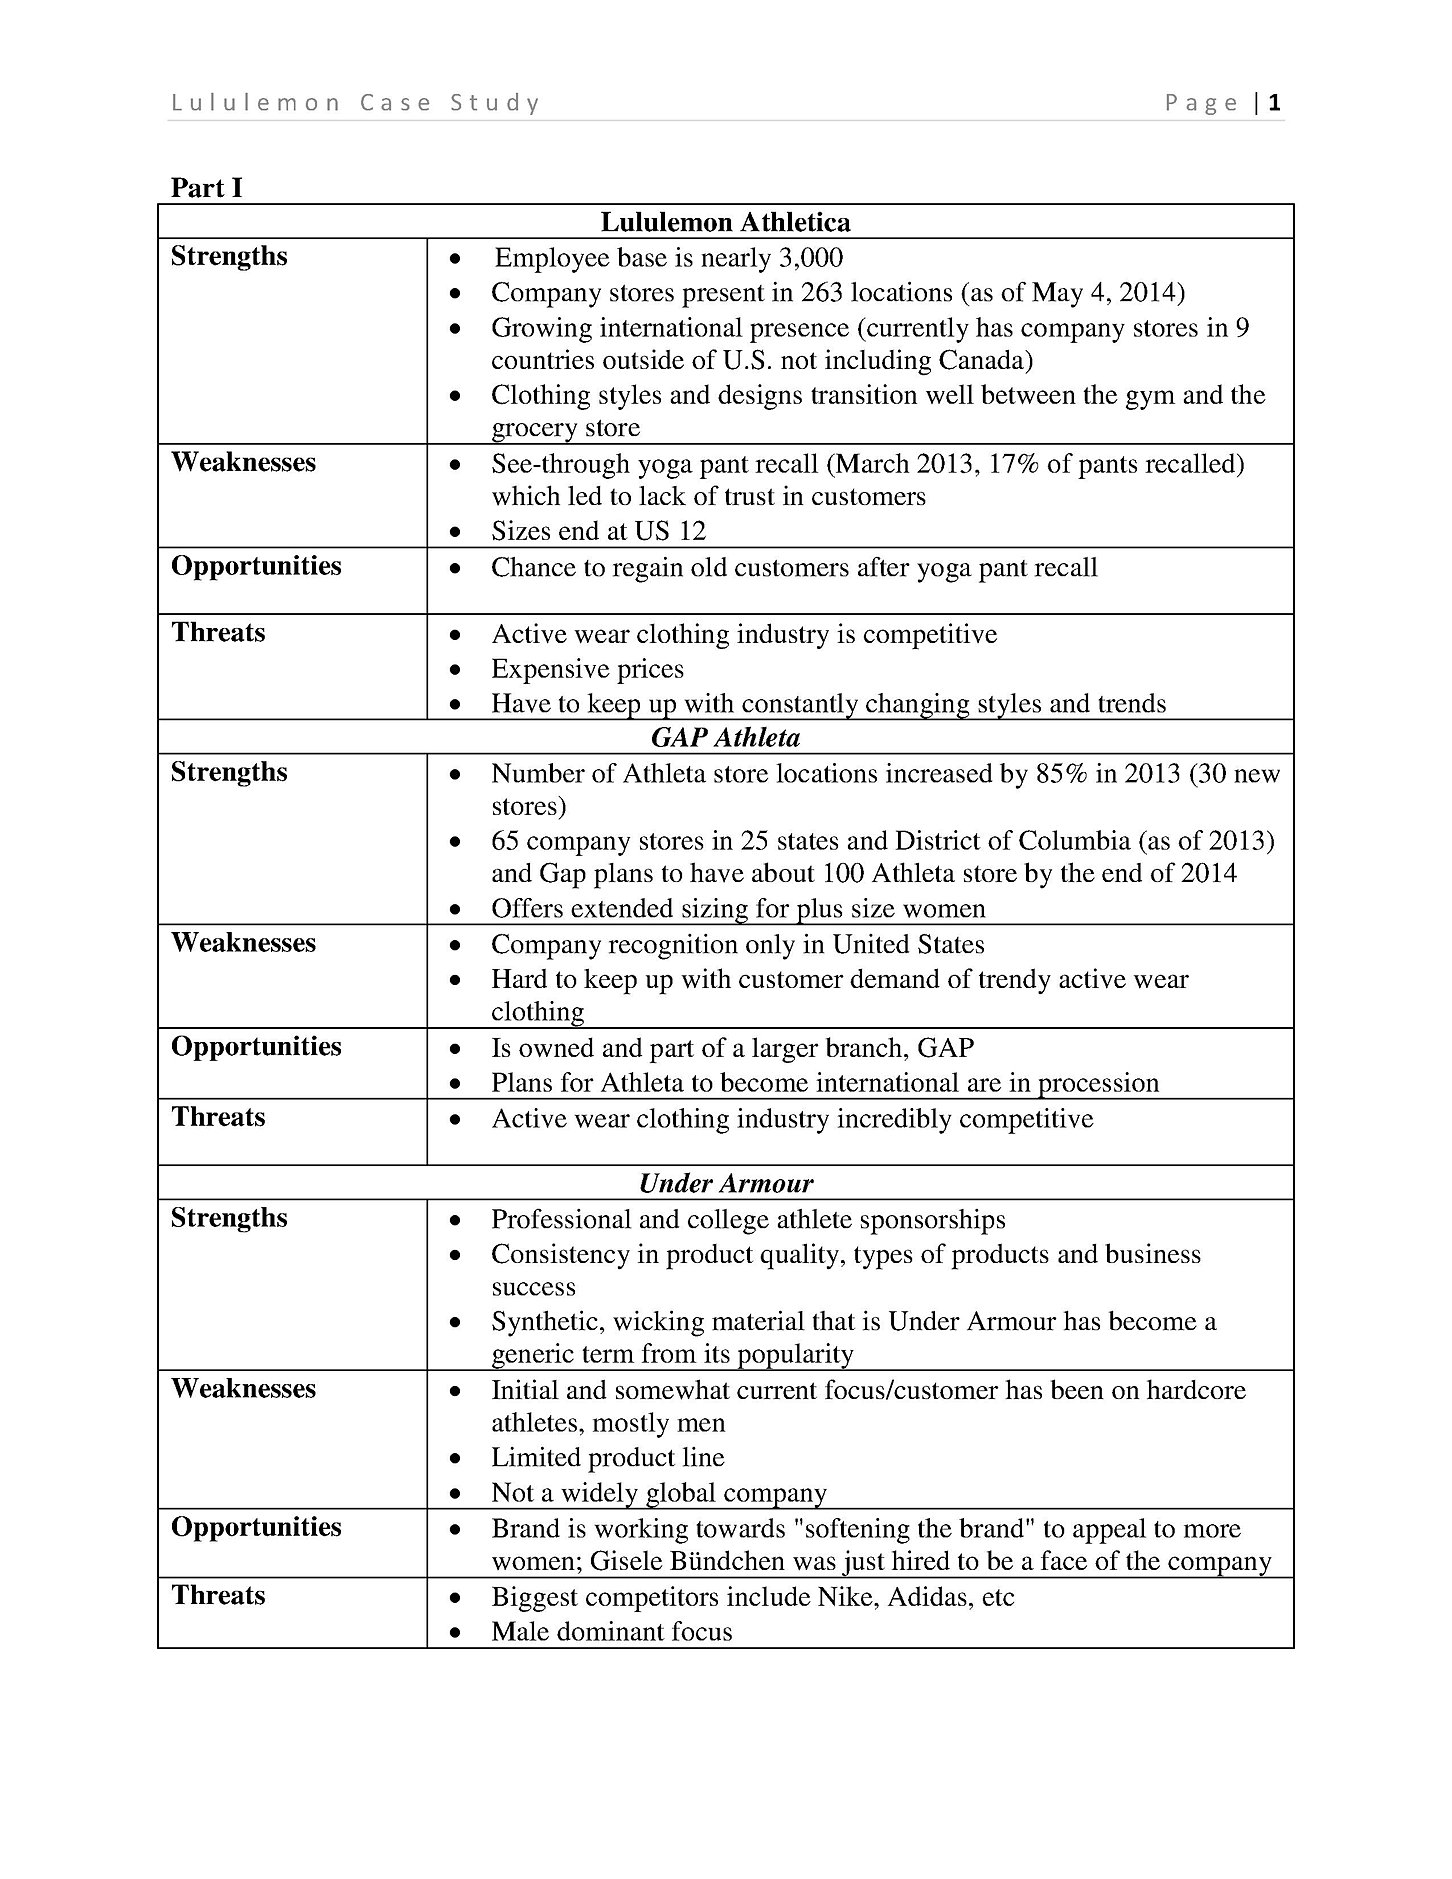 PESTEL Analysis Examples